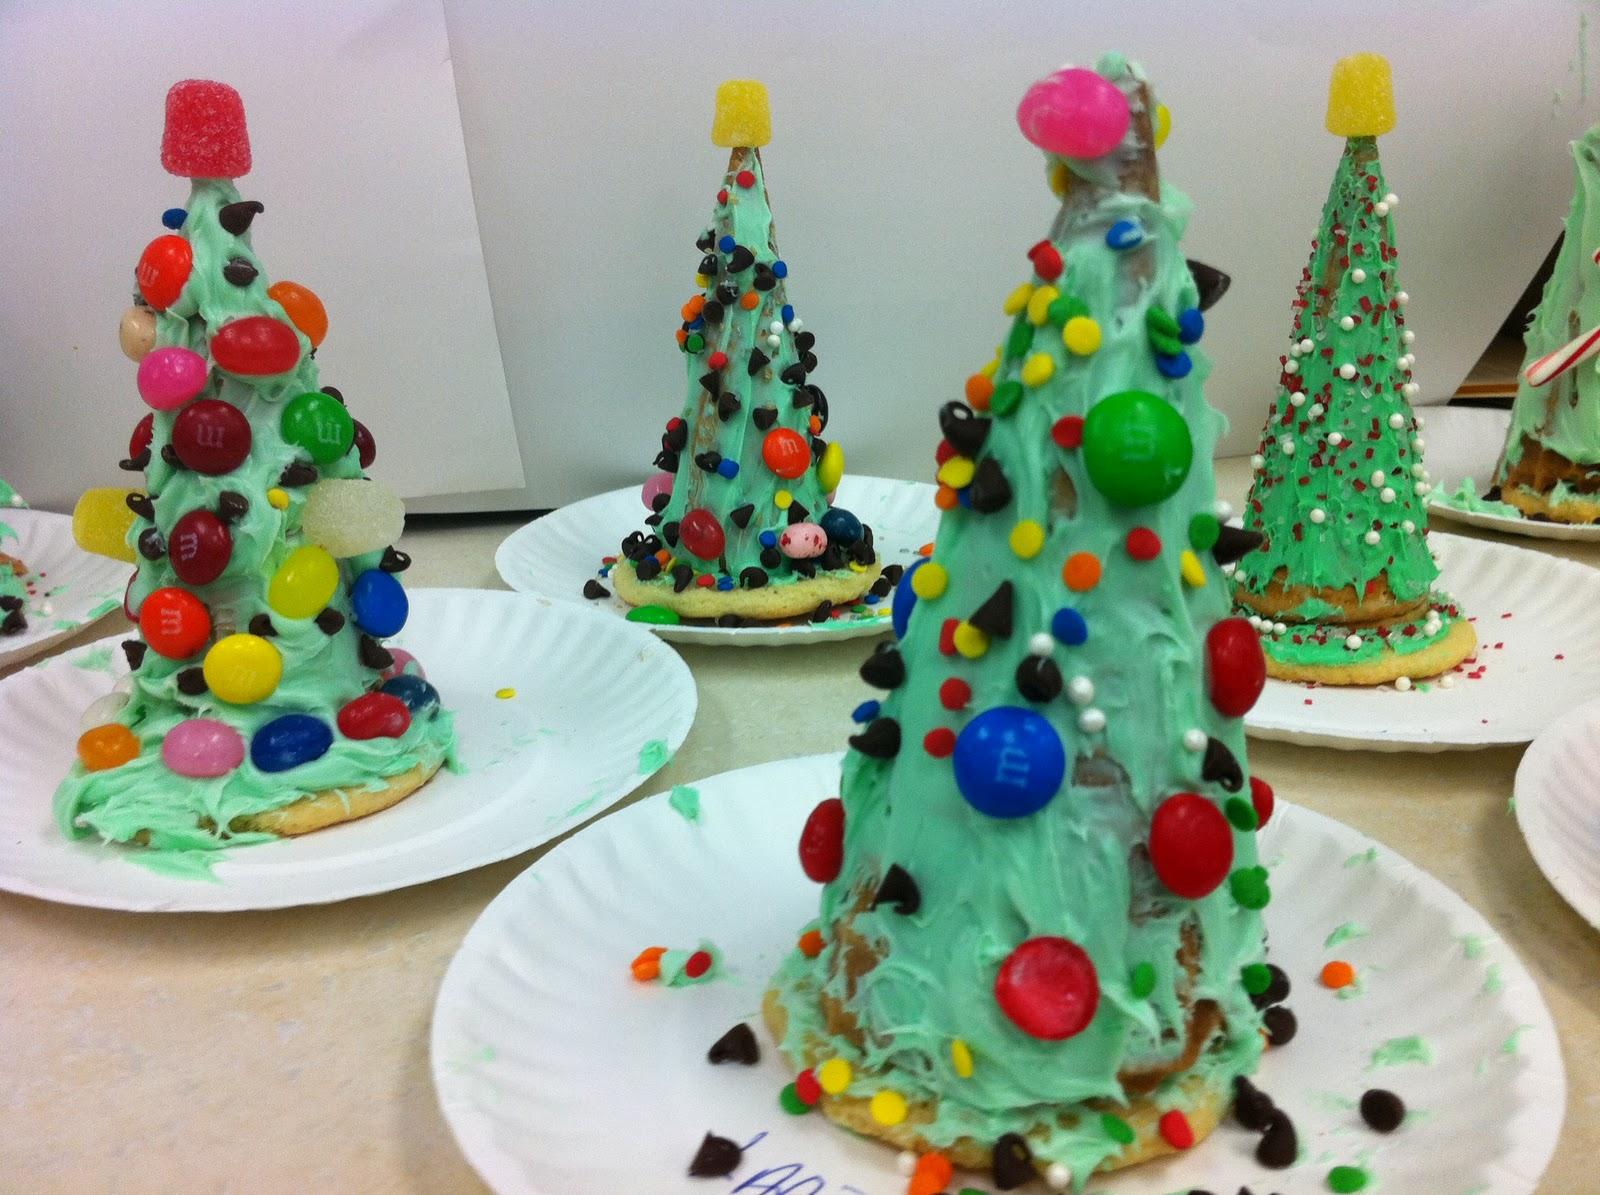 promo code 5e1e2 d0b2b My Life According to Pinterest: Edible Christmas Trees